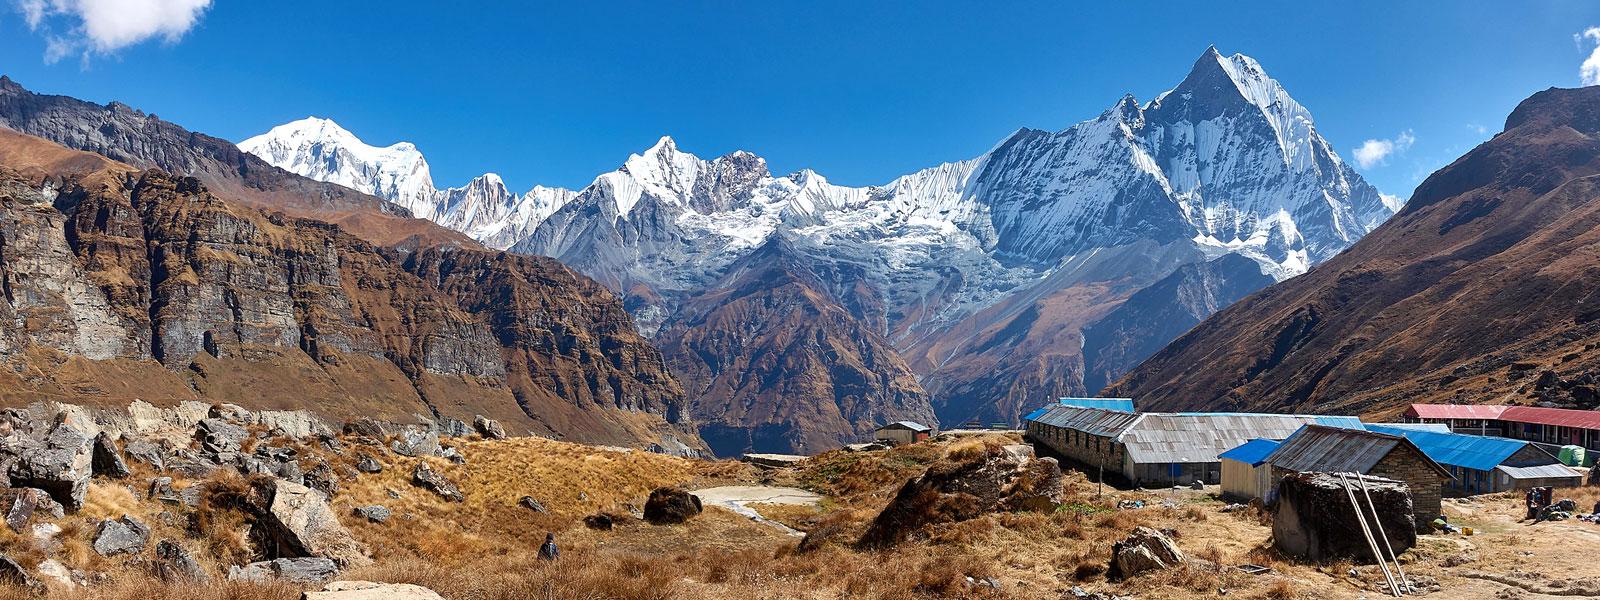 7 Days Annapurna Base Camp Trekking